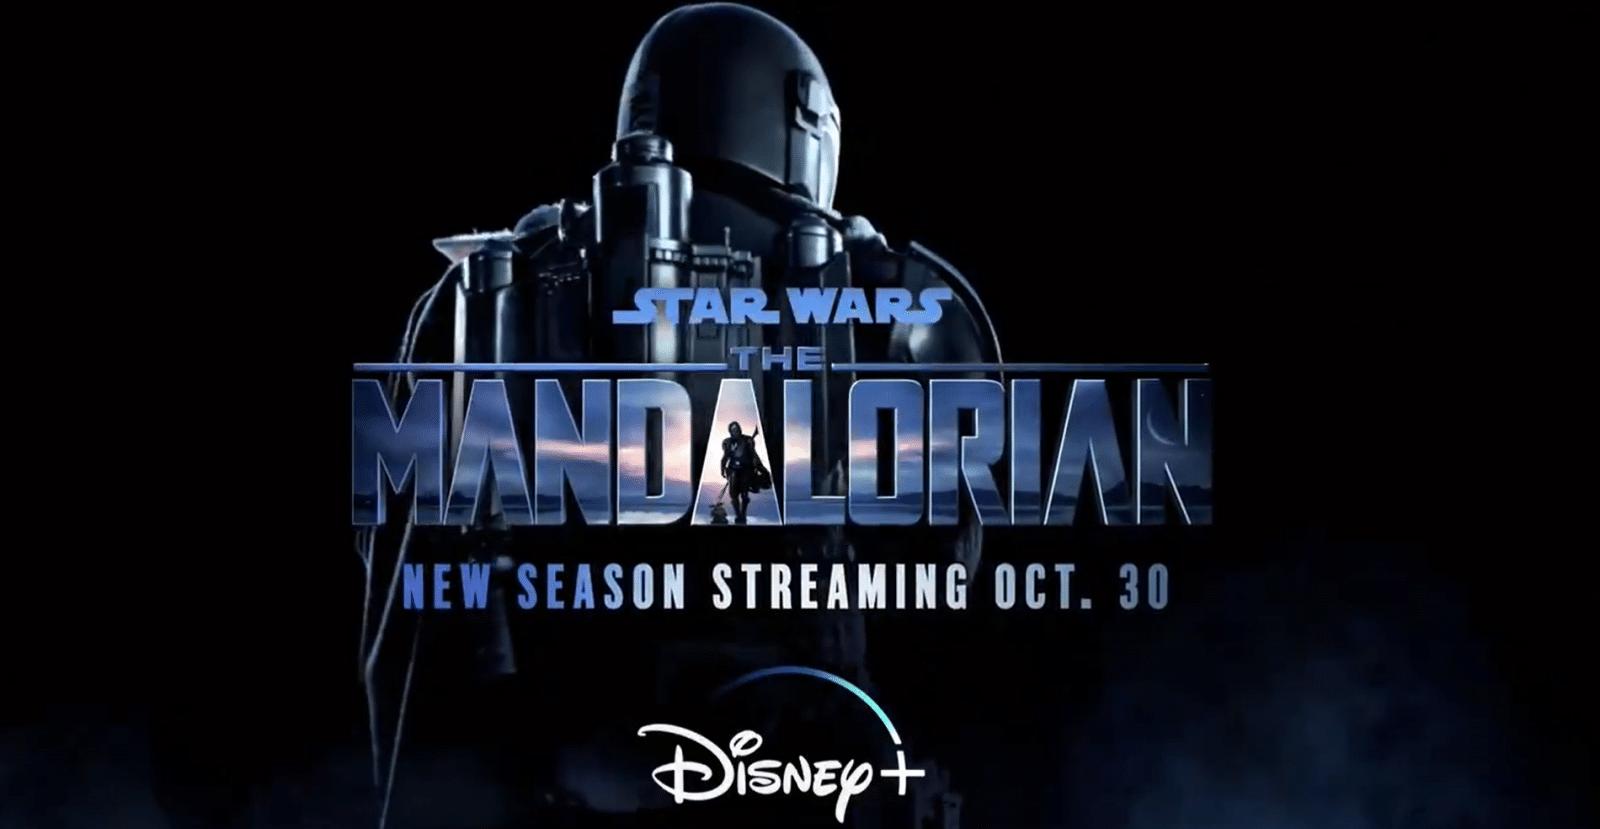 The Mandalorian season 2 teaser videos